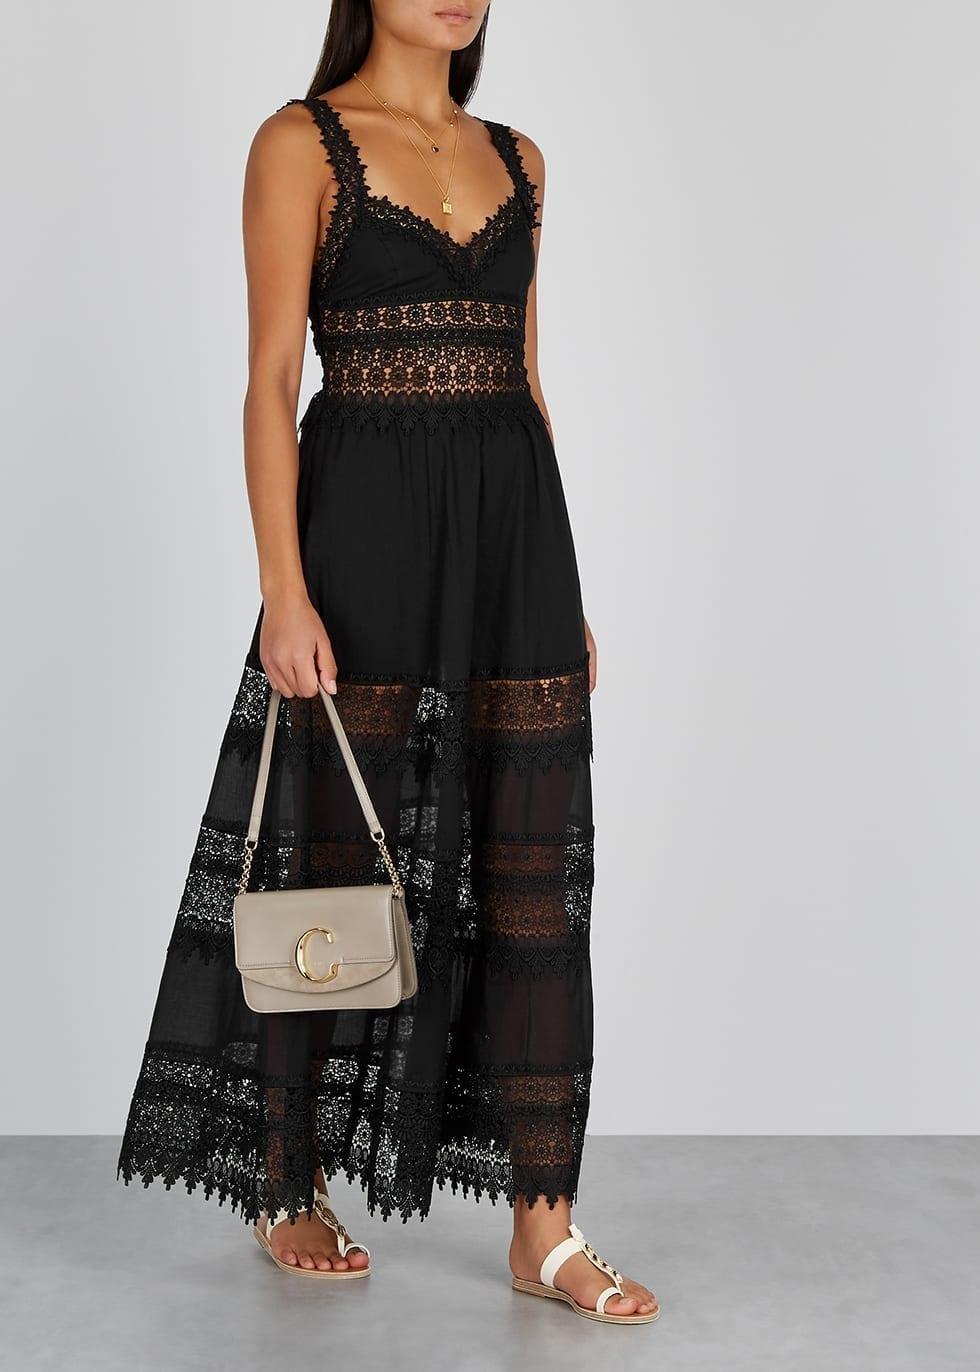 CHARO RUIZ Sophia Black Cotton-blend Maxi Dress